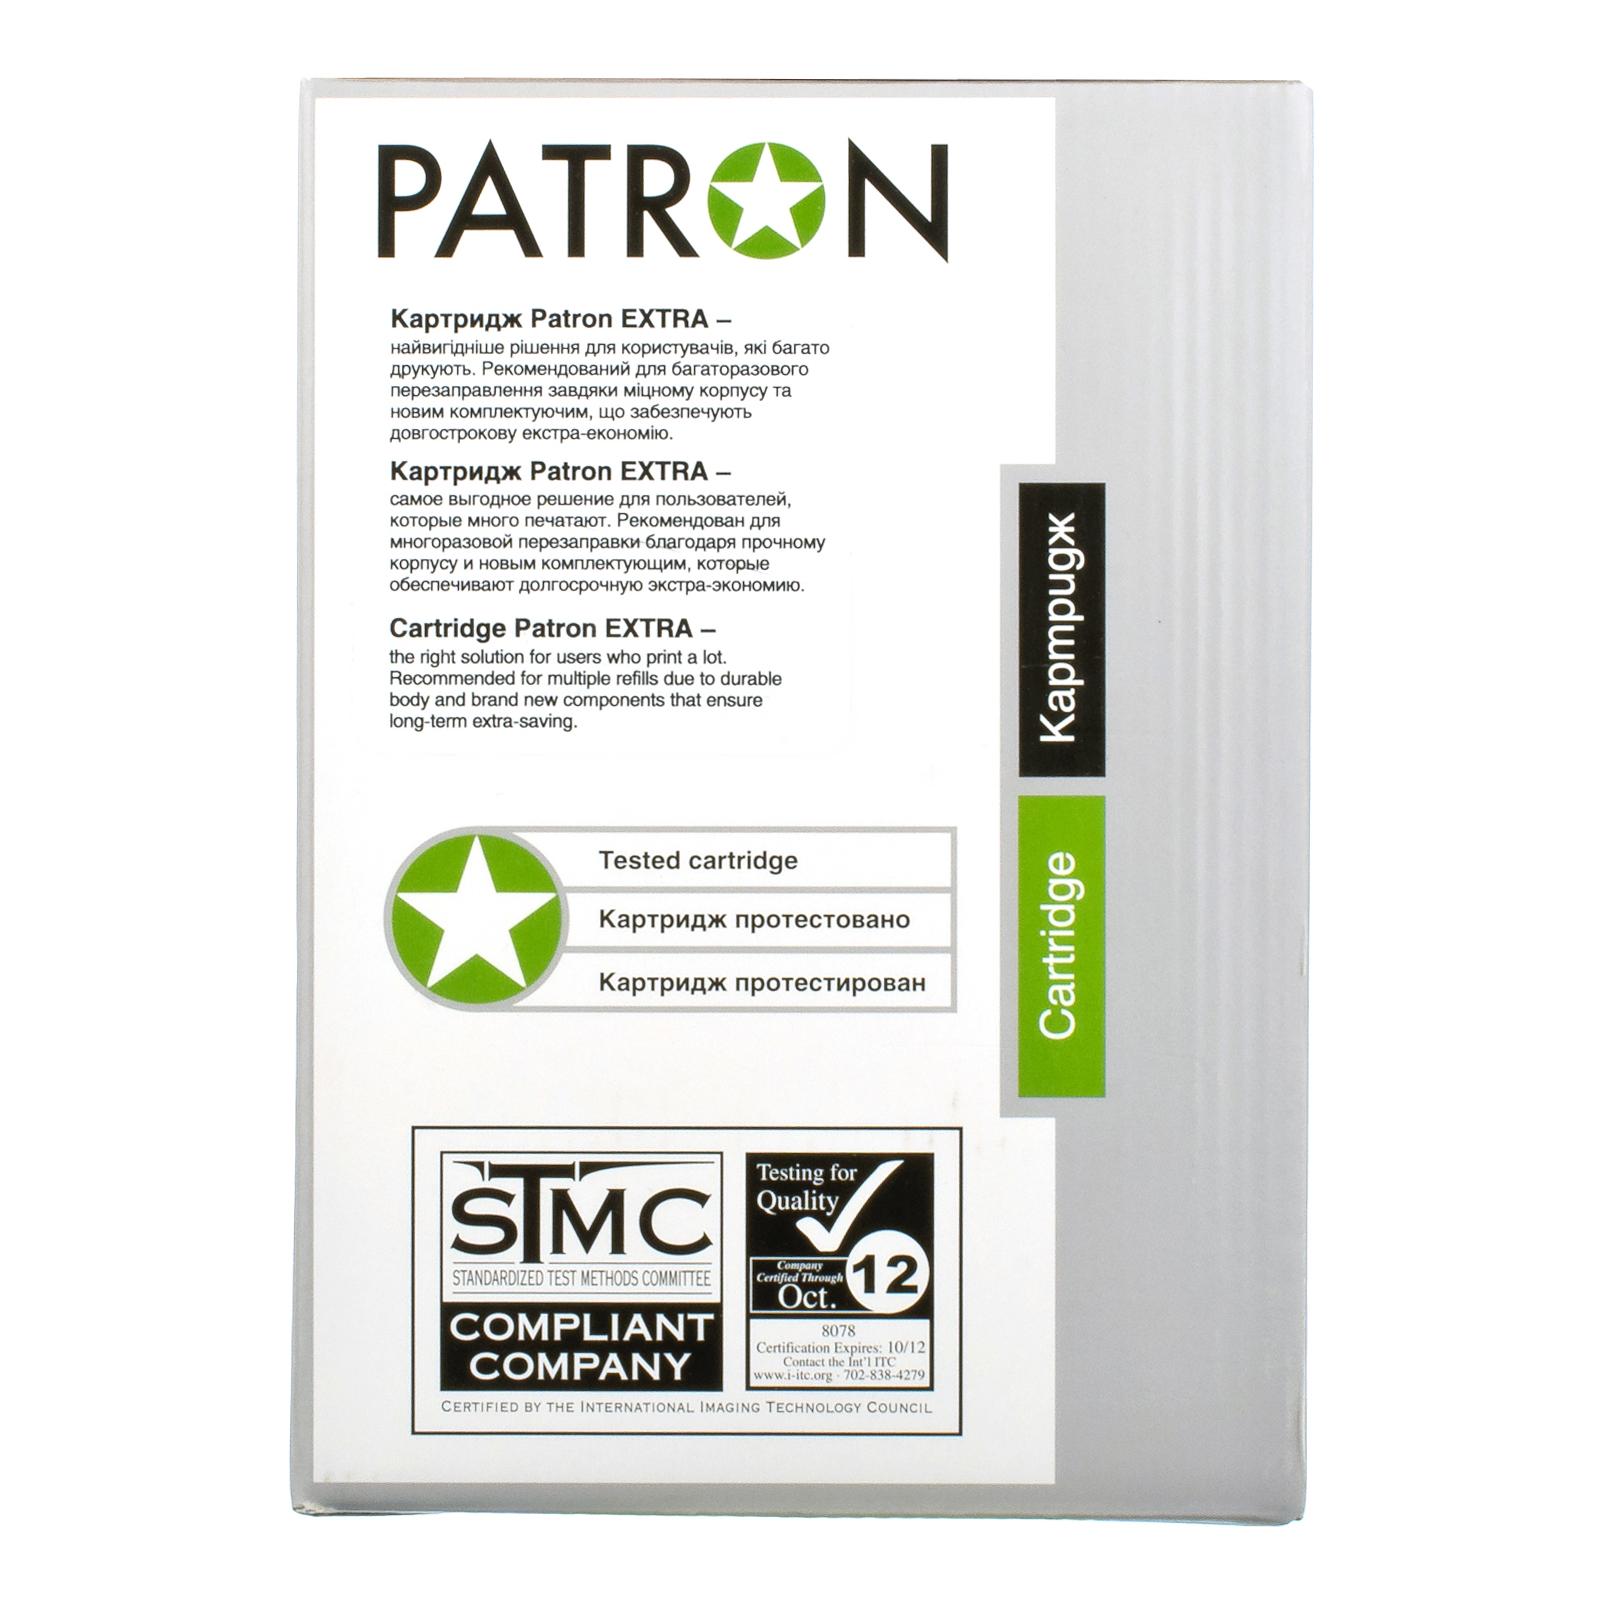 Картридж PATRON XEROX WC 3210/3220 Extra (PN-01485R) изображение 5